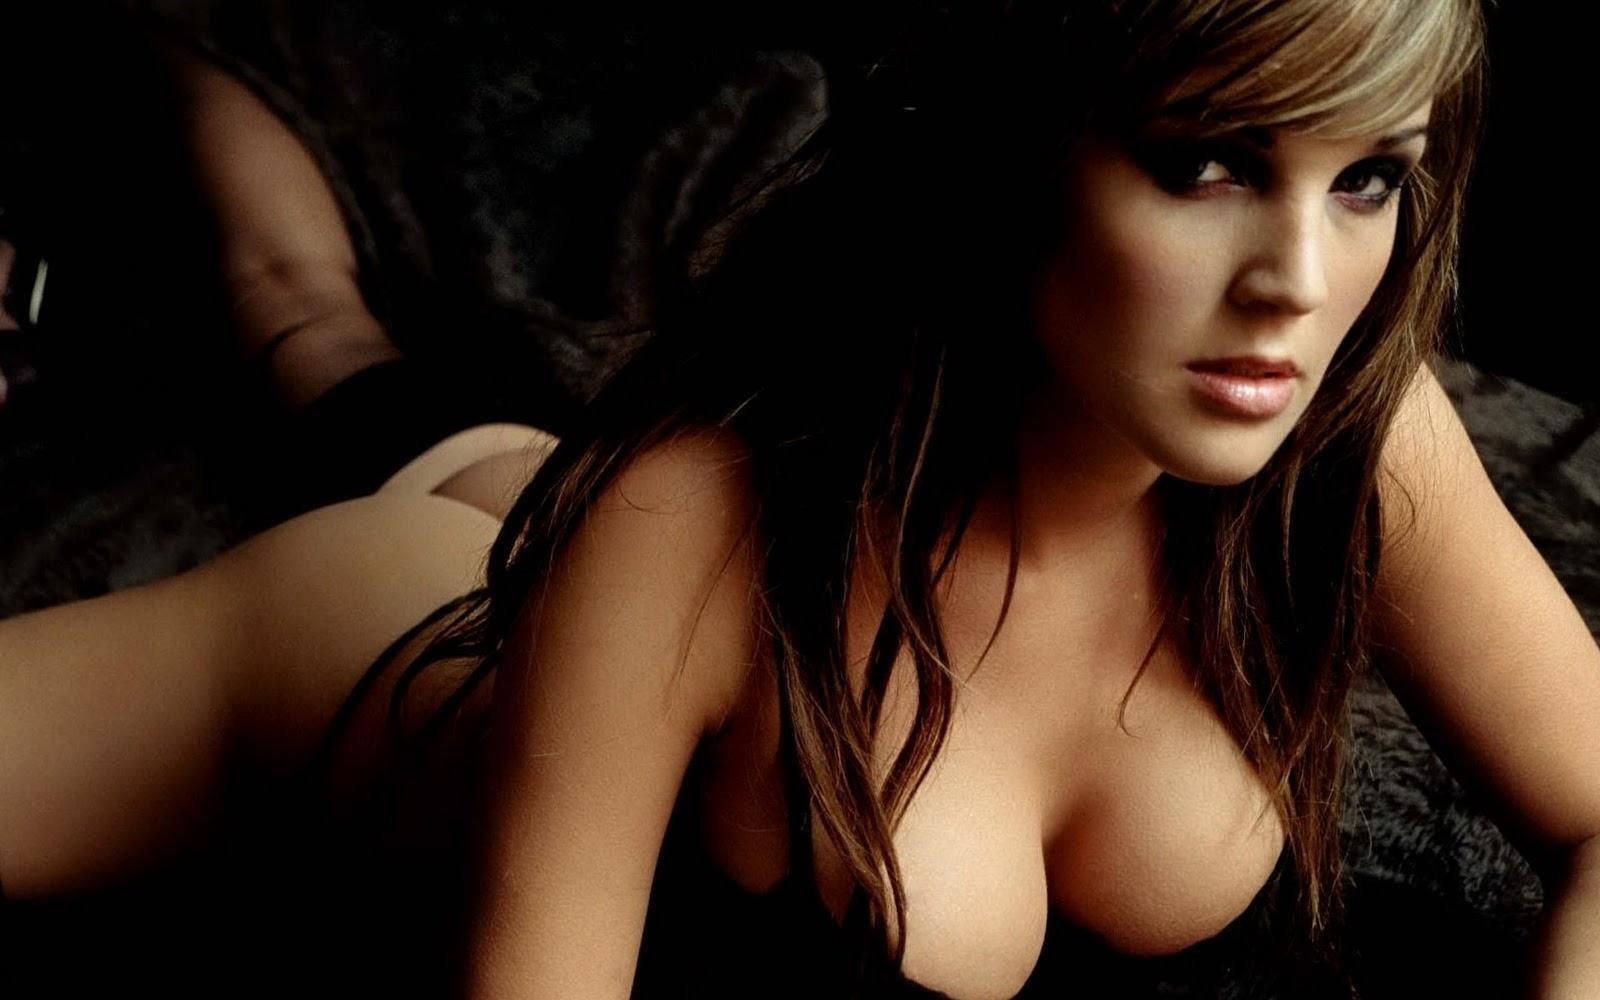 http://2.bp.blogspot.com/_Kpi0thIqeJI/TSGMyeNdXJI/AAAAAAAABVA/FzP3fjbg60c/s1600/sexy-busty-girl-freehd.blogspot.com.jpg